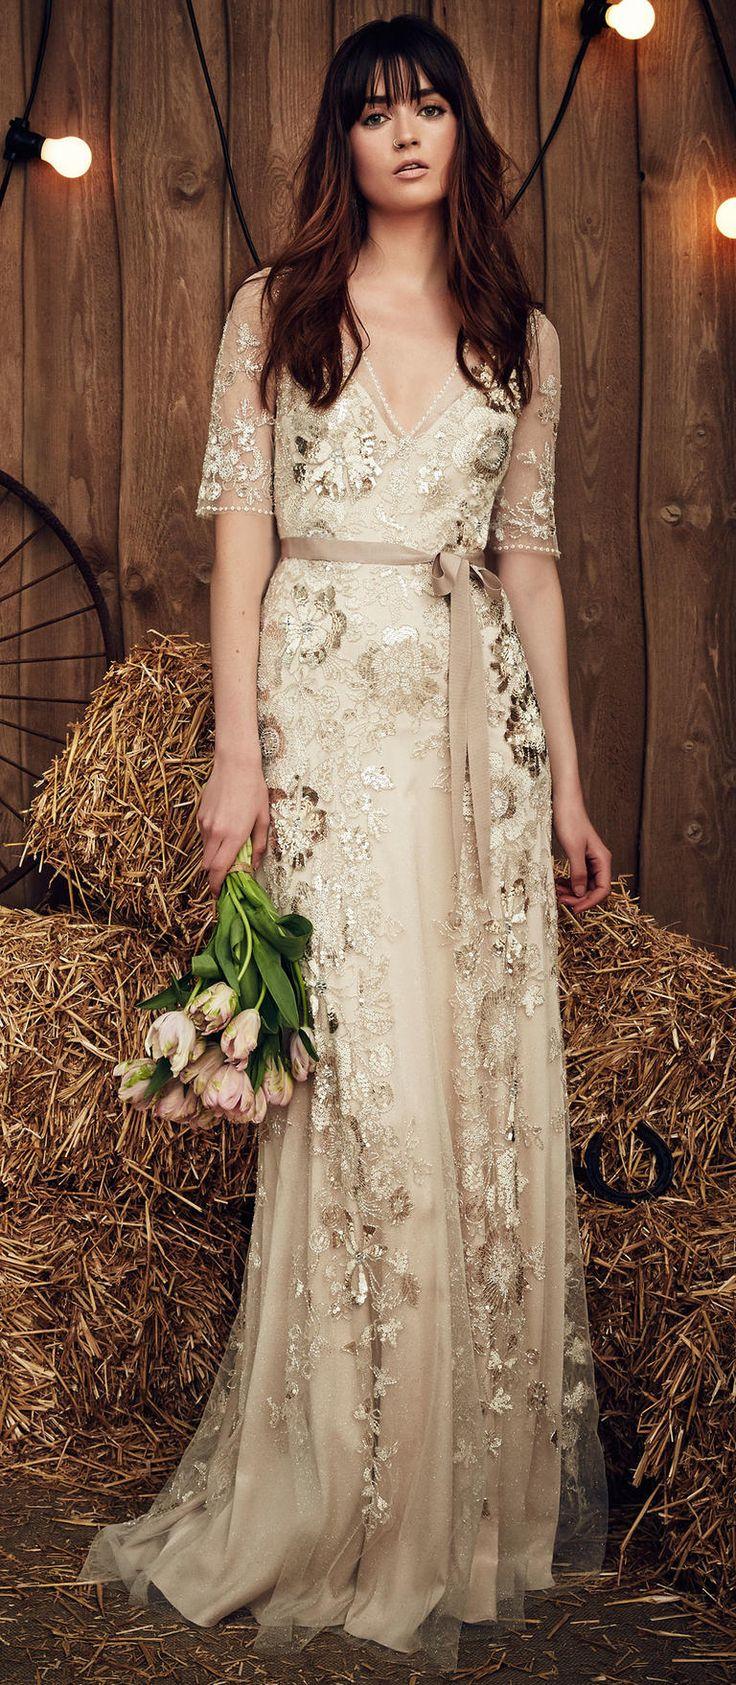 gypsy wedding dresses beige wedding dress Celadon Green Hits the Runway at Jenny Packham s Gypsy Inspired Spring Show Beige Wedding DressChampagne